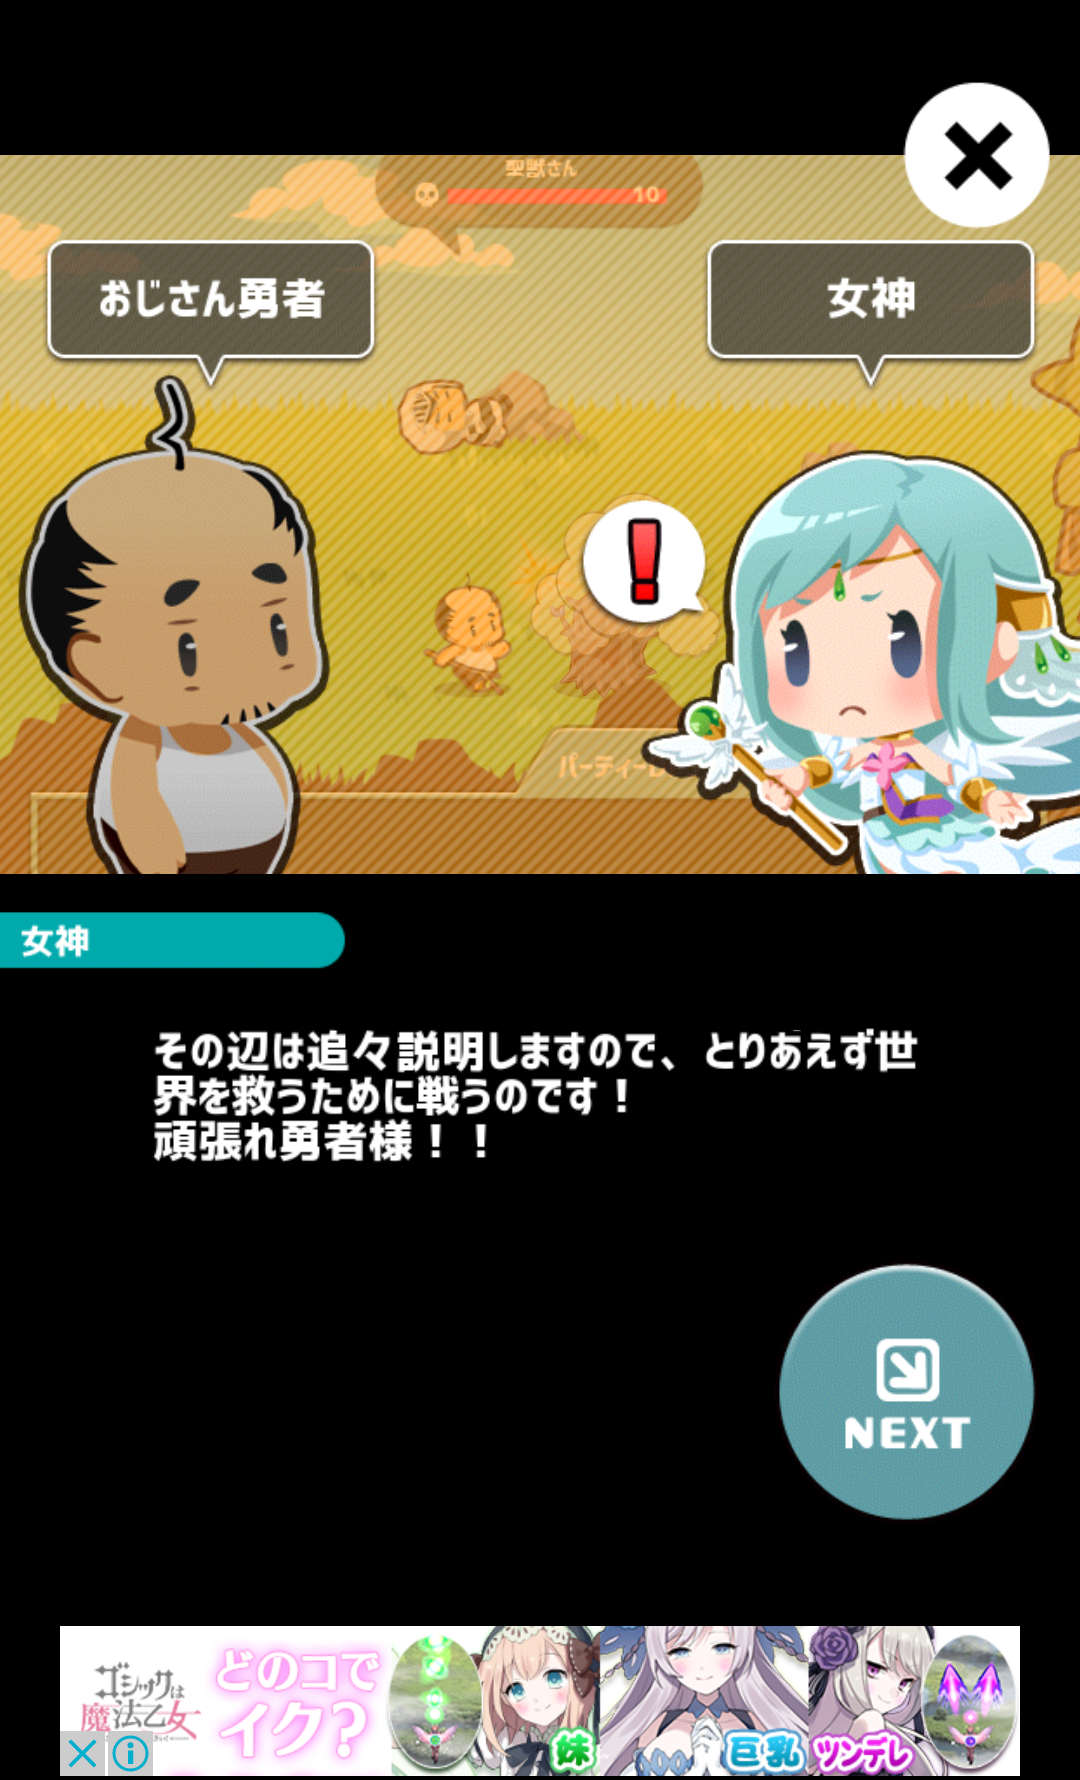 androidアプリ おじクエ - OJISAN QUEST -攻略スクリーンショット1